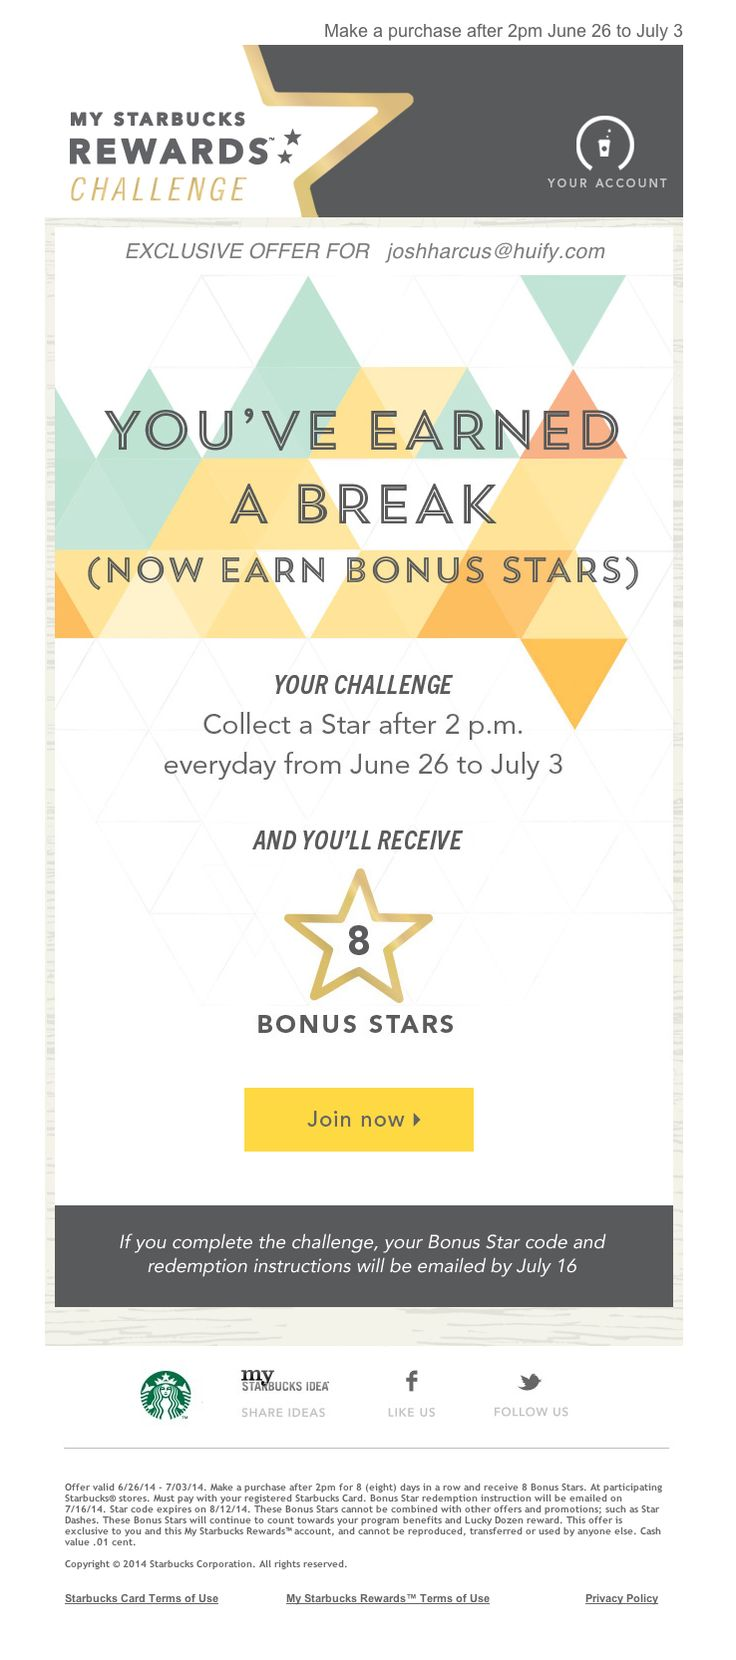 Starbucks Rewards - Summer Break  http://ebm.e.starbucks.com/c/tag/hBTq4OuAJvkyvB86zzzNtsID6qq/doc.html?t_params=EMAIL%3Djoshharcus%2540huify.com%26PASSWORD%3DAJvkyvNtsID6BTq4OuikWuUXV6Qga5utm_source=msrutm_medium=emailutm_content=hostedutm_campaign=summer2wk1-campaign2-8pm